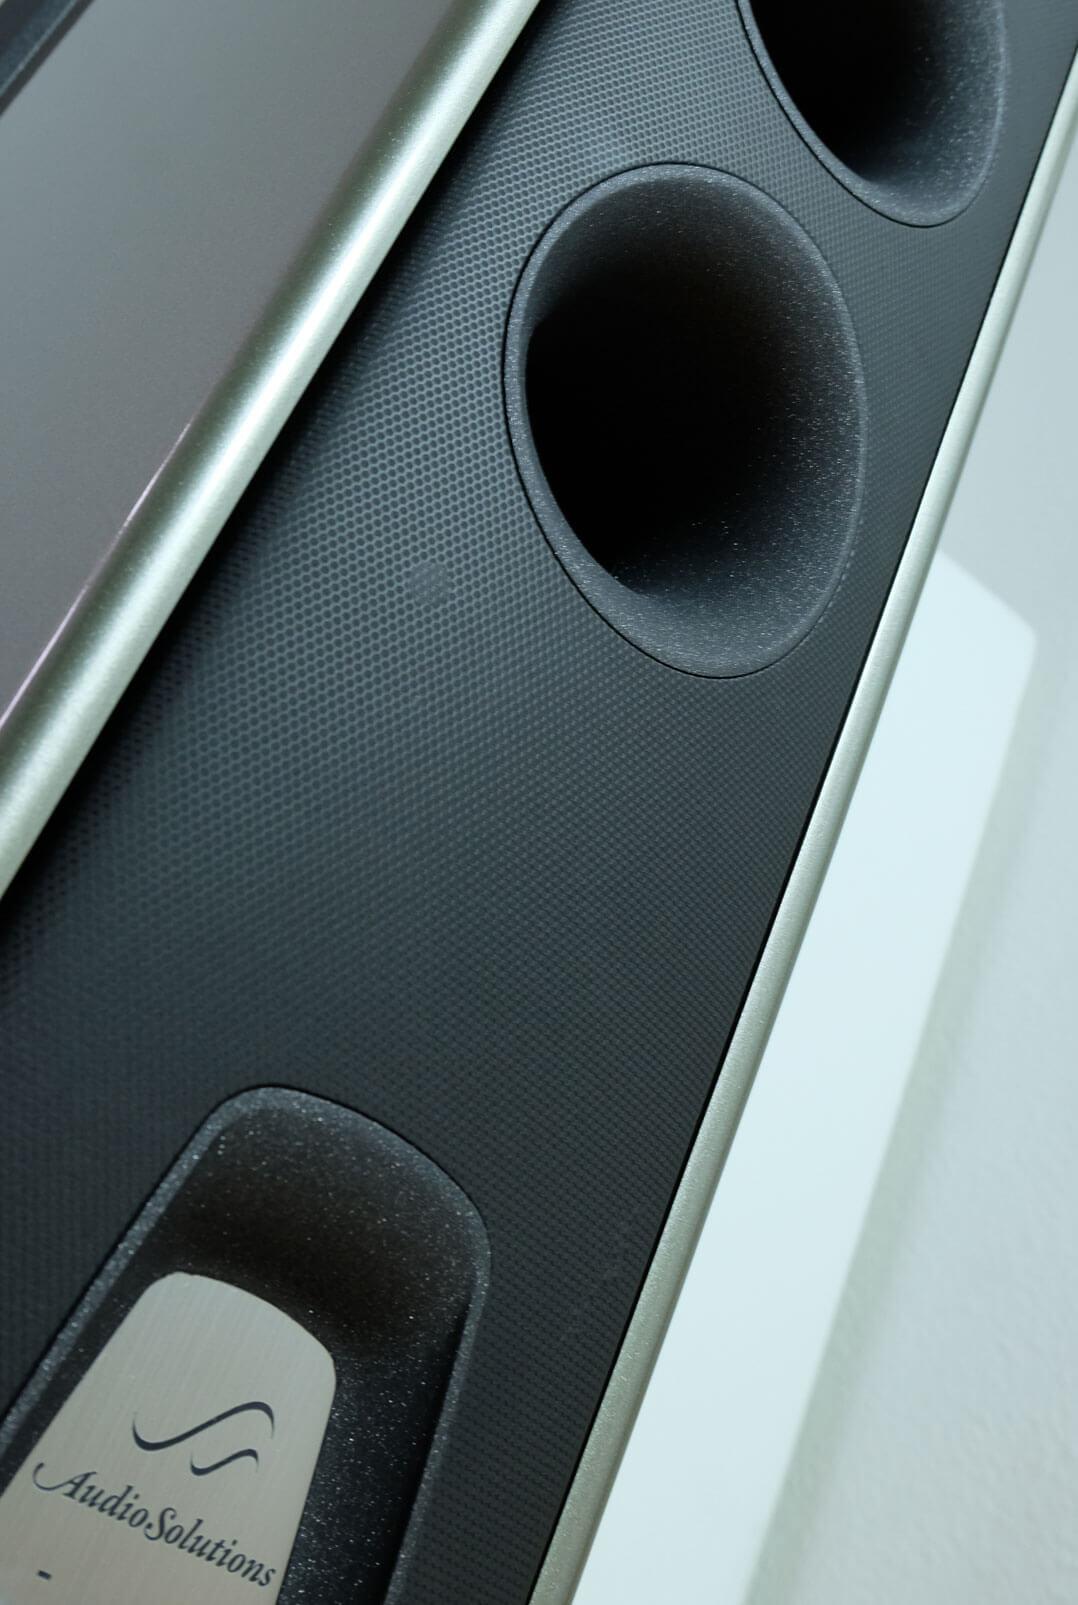 AudioSolutions Virtuoso M: Rückseite/Bassreflexöffnung